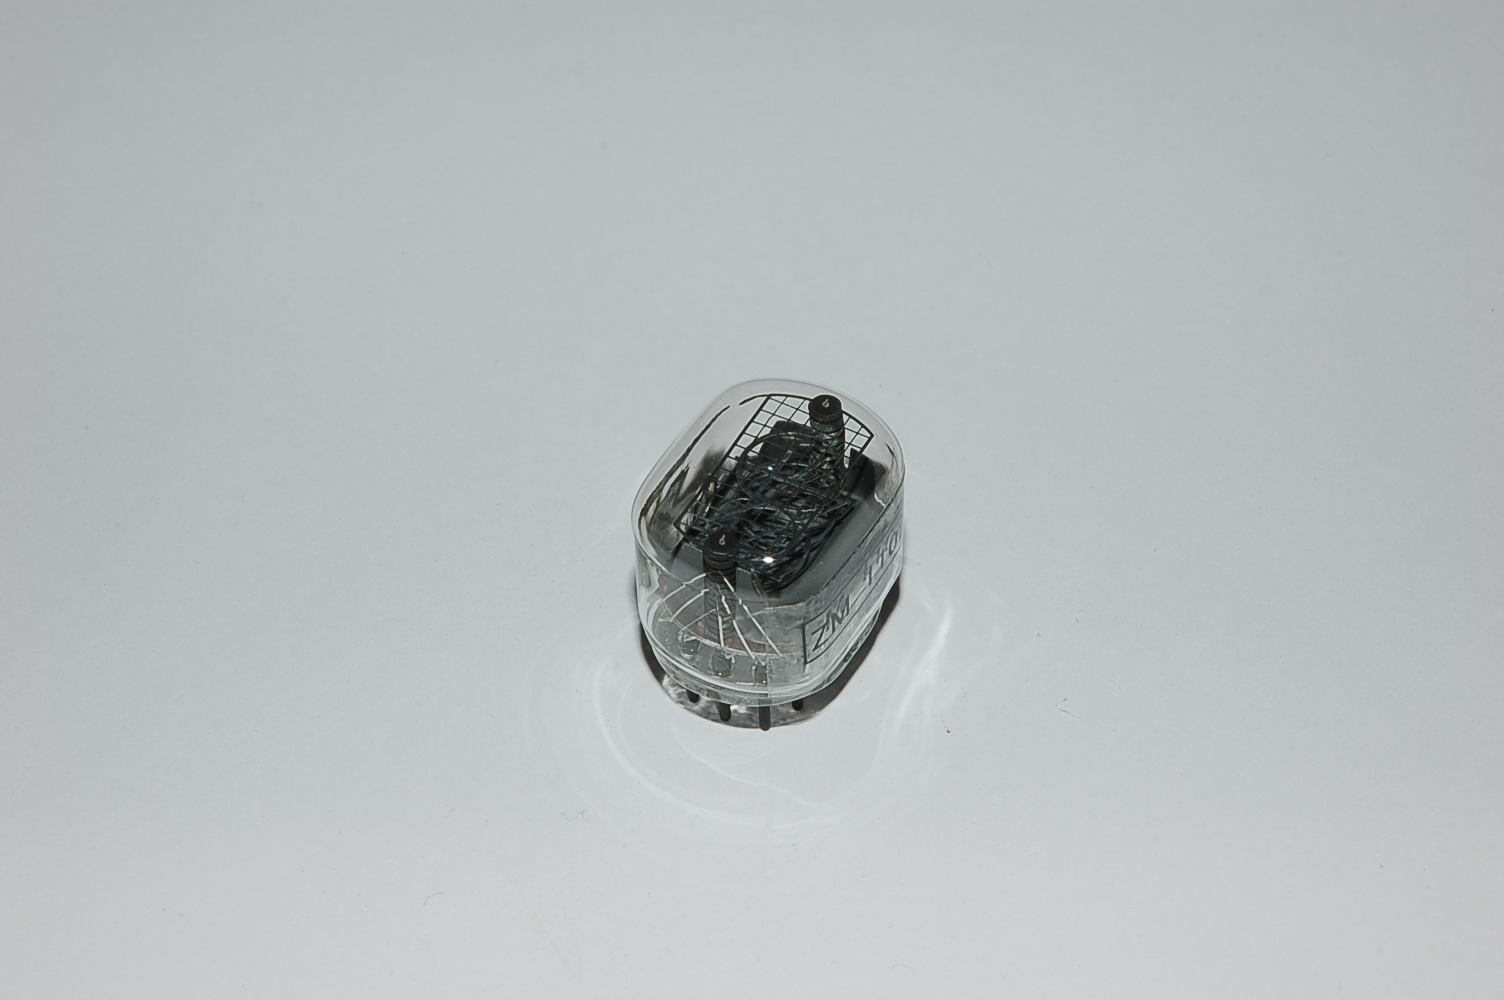 zm1102